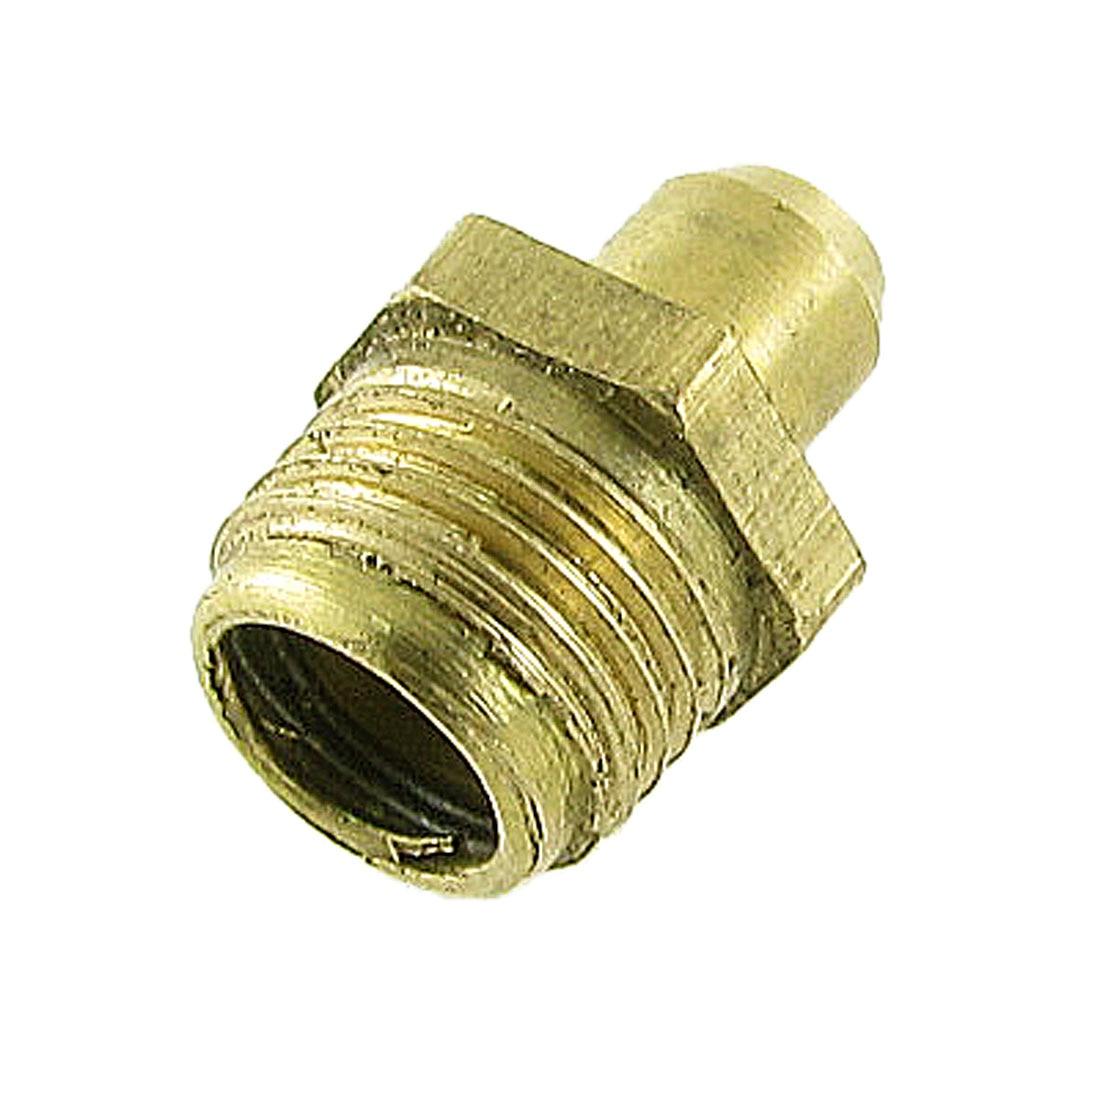 X Autohaux Brass Male Thread 10Mm M10 Straight Hydraulic Grease Nipple